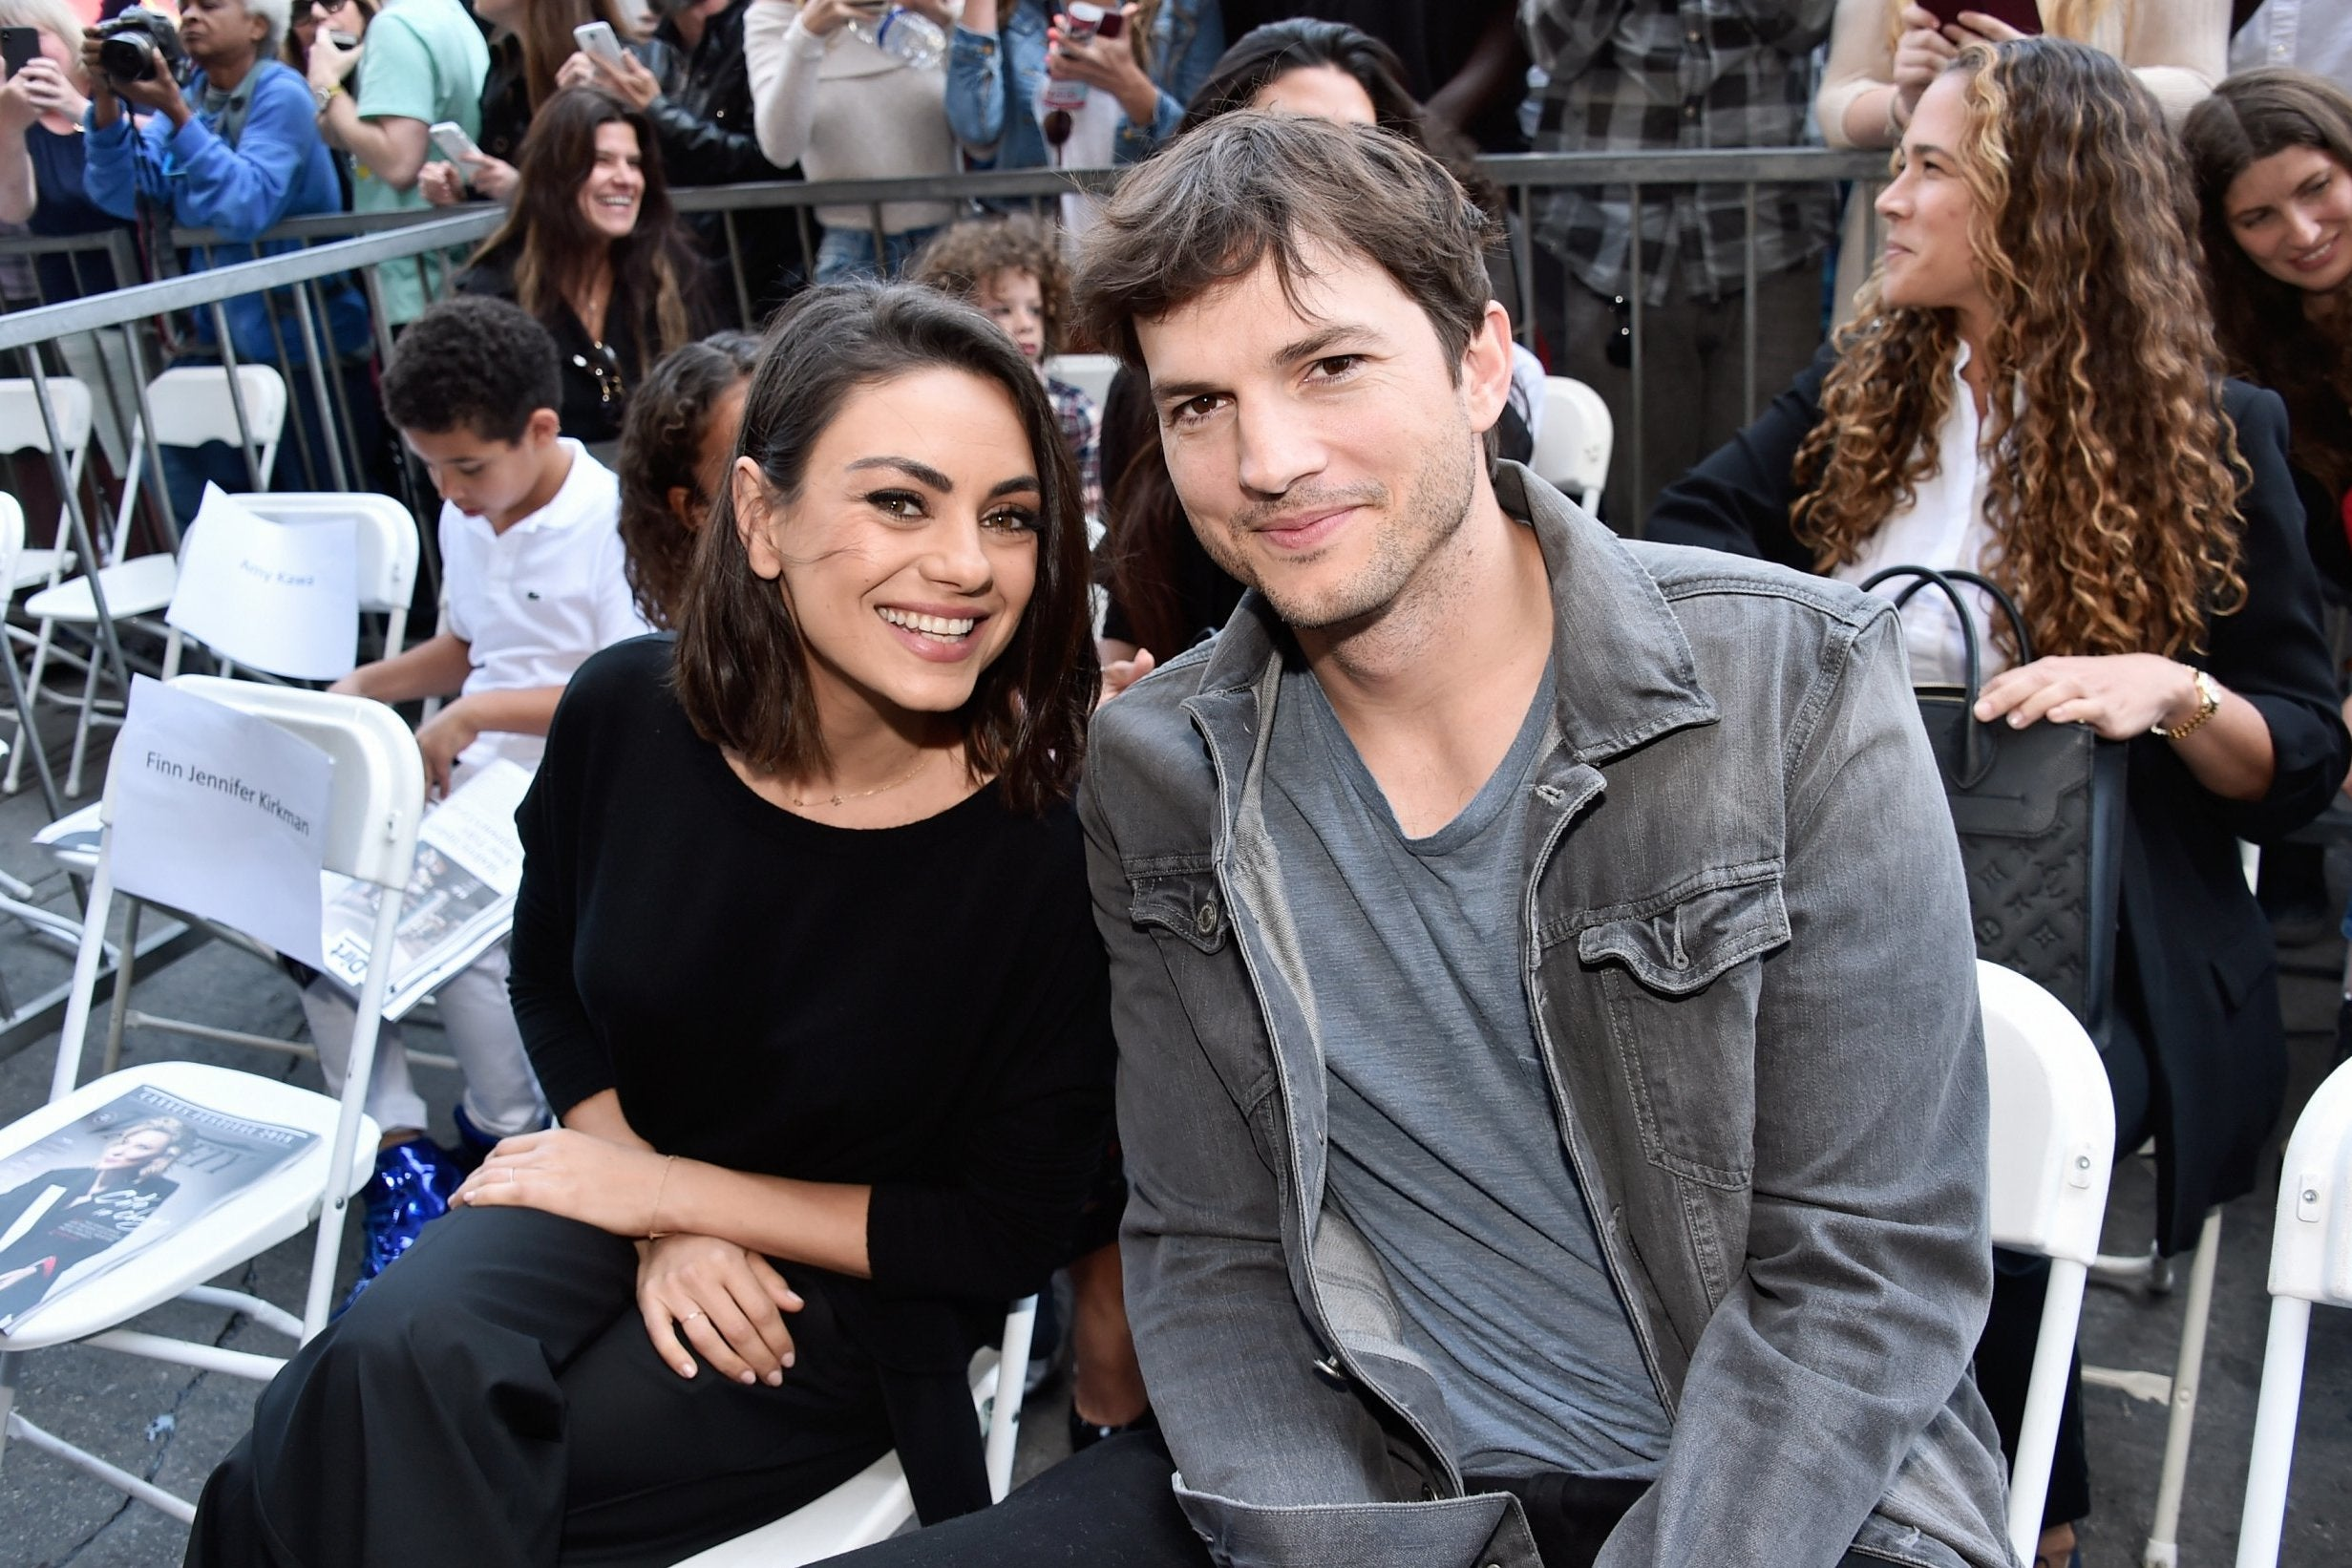 Mila Kunis and Ashton Kutcher visited the hometown of actress Chernivtsi